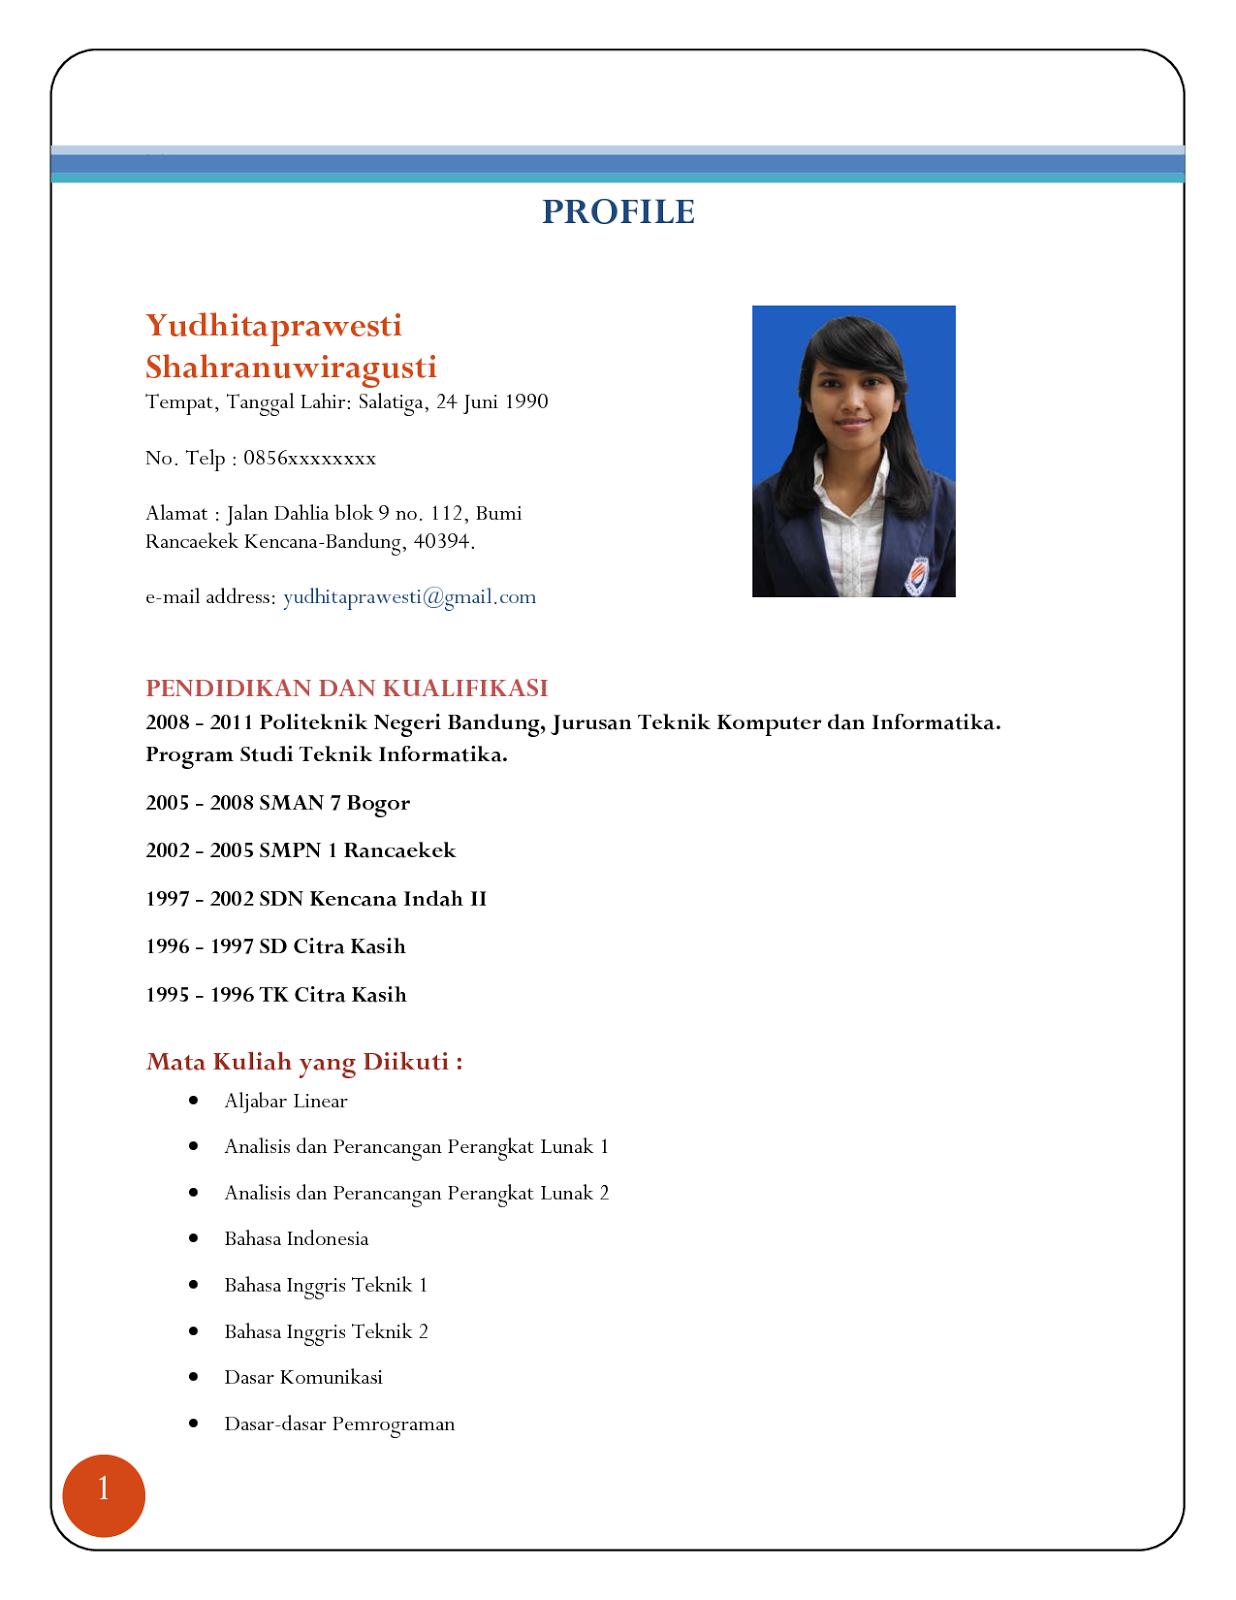 Contoh Resume Lamaran Kerja untuk Fresh Graduate | Quotes Wanita